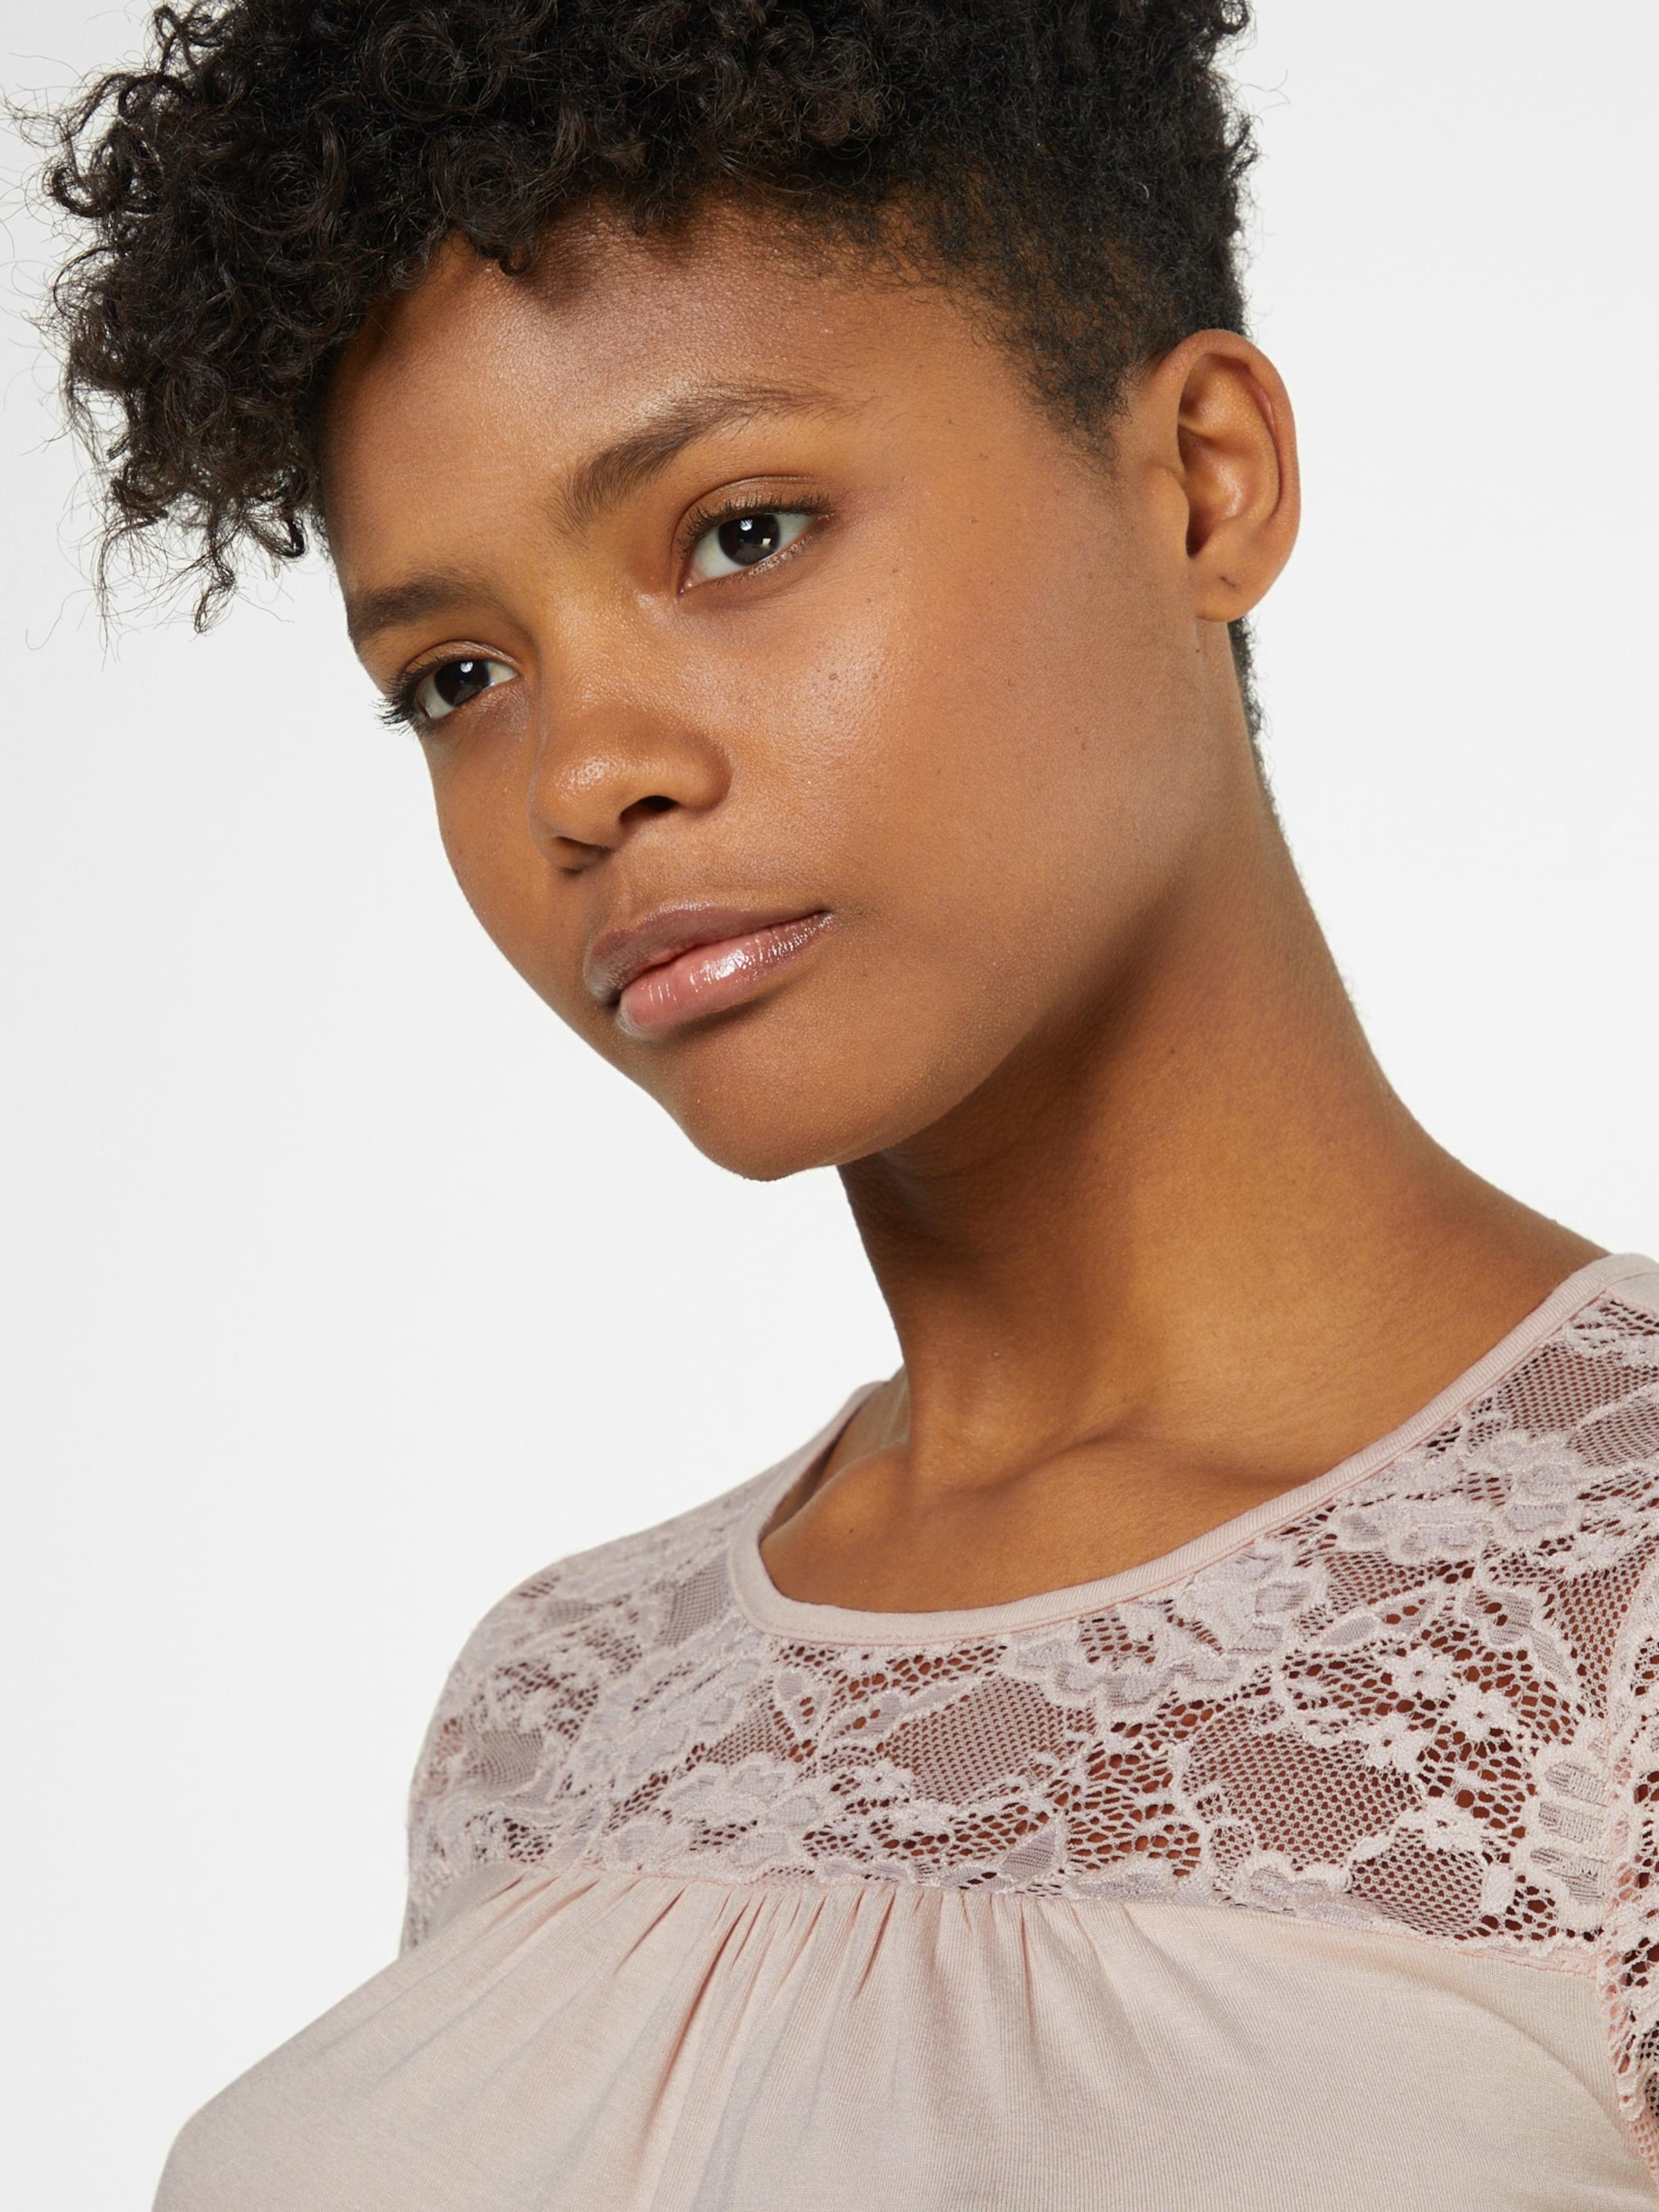 Kaffe Shirts 'Siri Lacy Blouse' Auslass-Angebote Footlocker Finish Finden Große Online sEc1GJ16LL